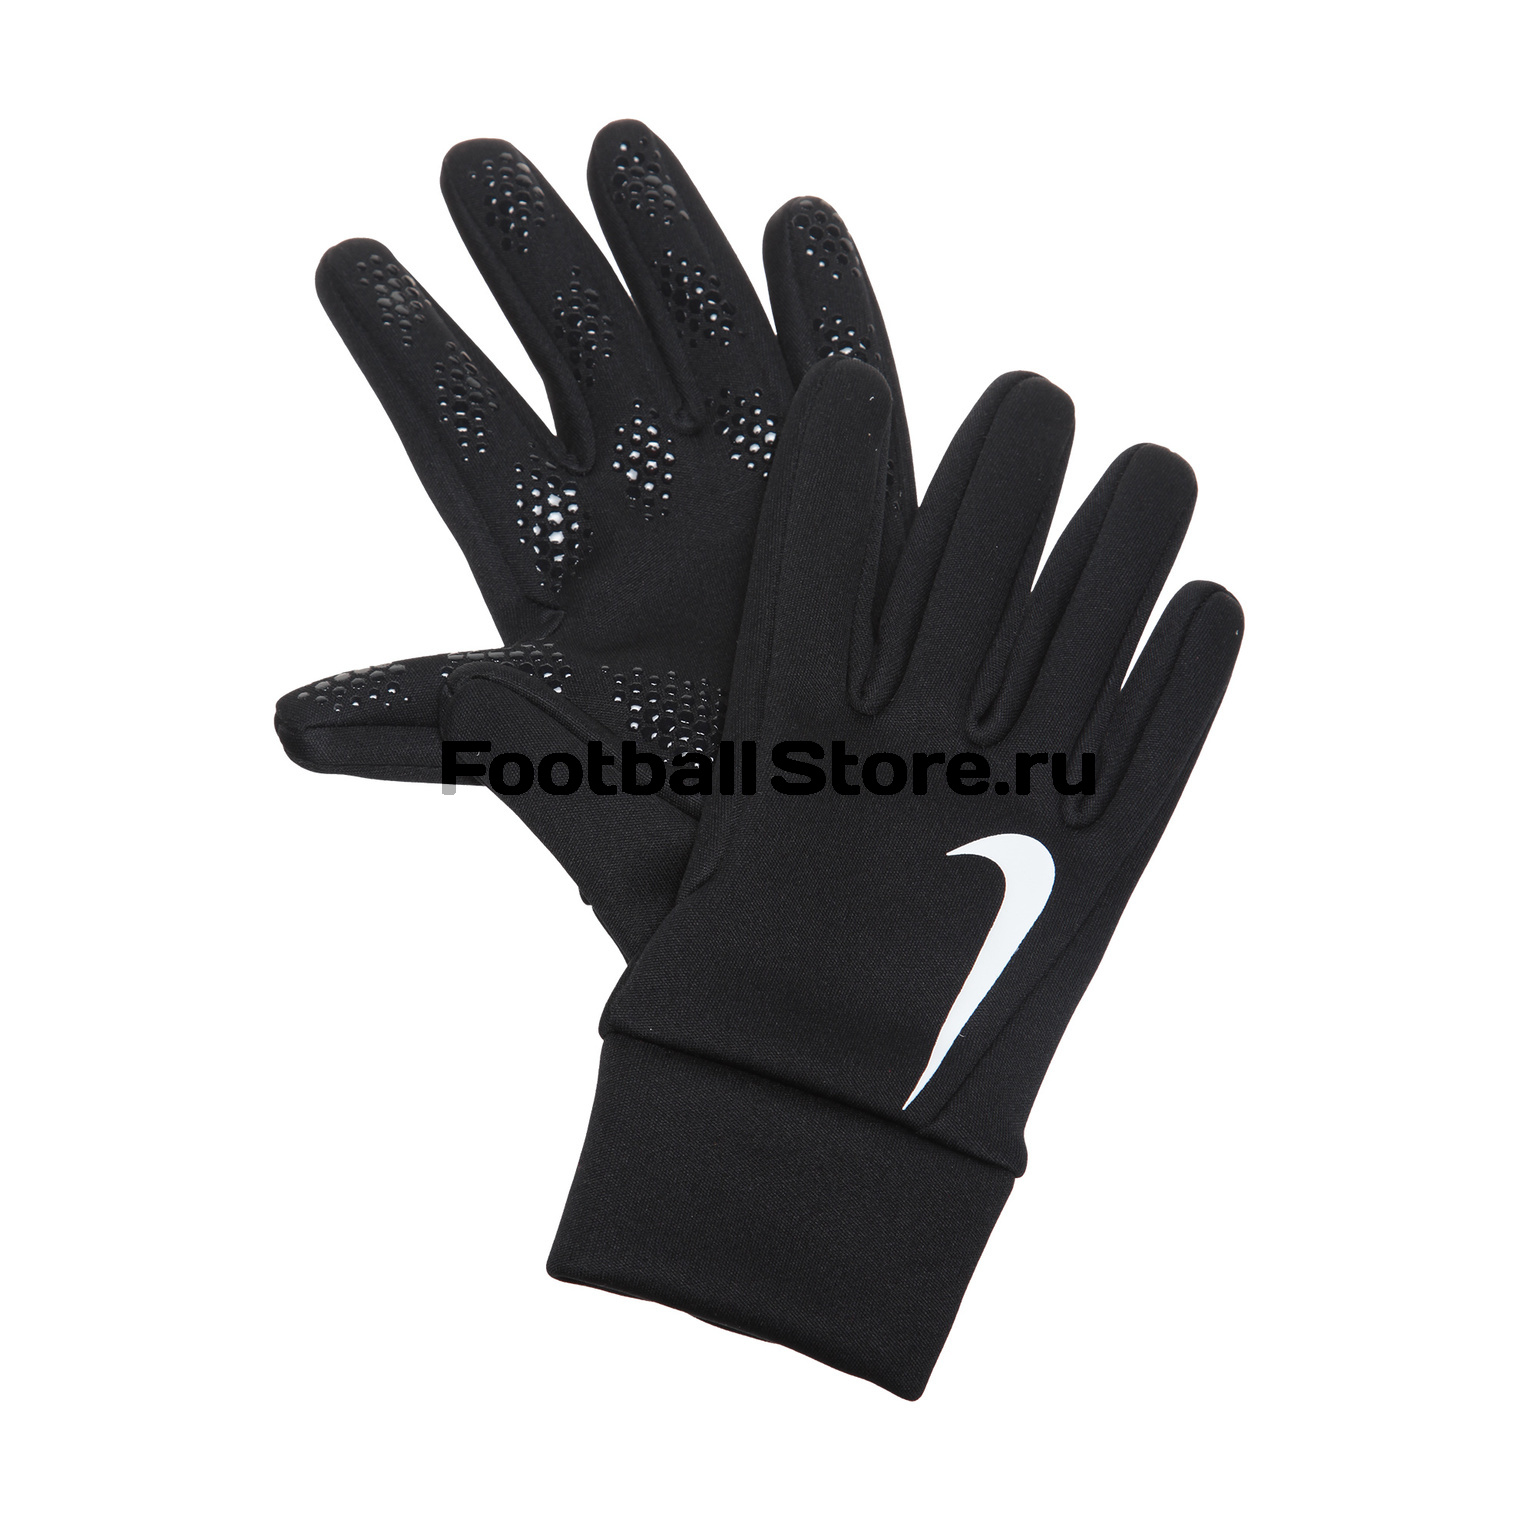 Перчатки Nike Перчатки тренировчоные Nike Hyperwarm Field GS0322-013